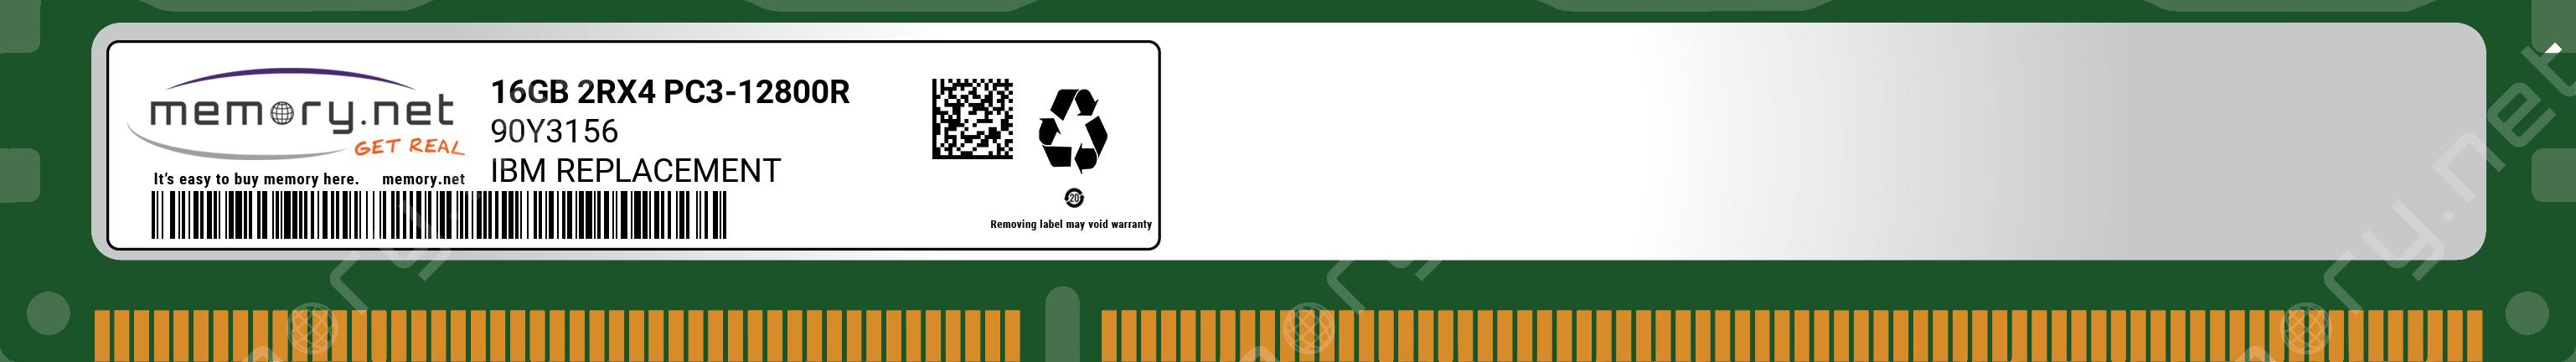 90Y3156